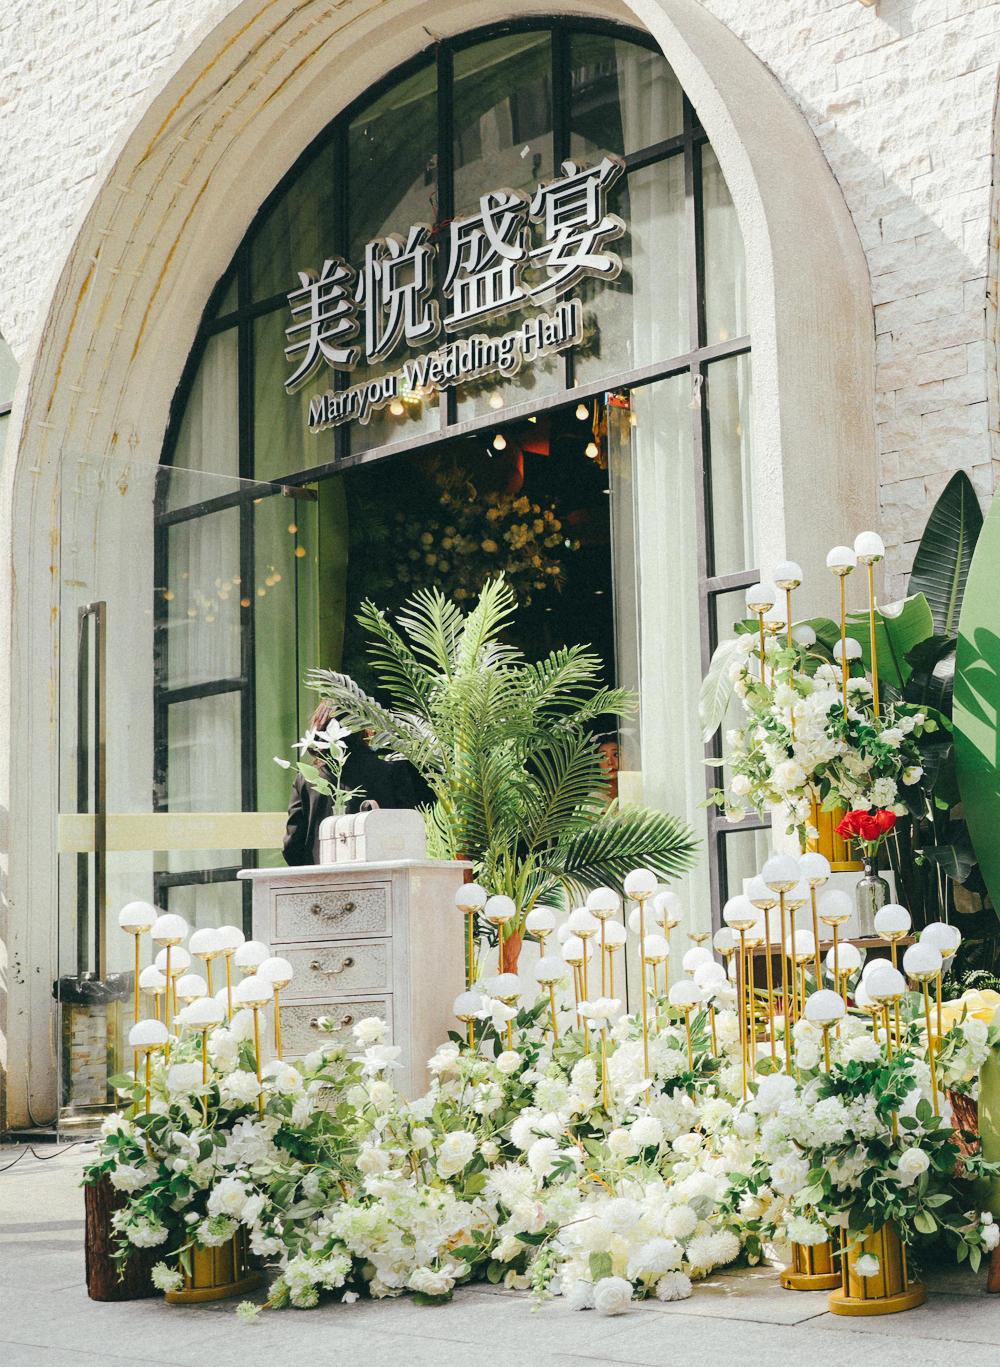 Marryou婚礼艺术中心